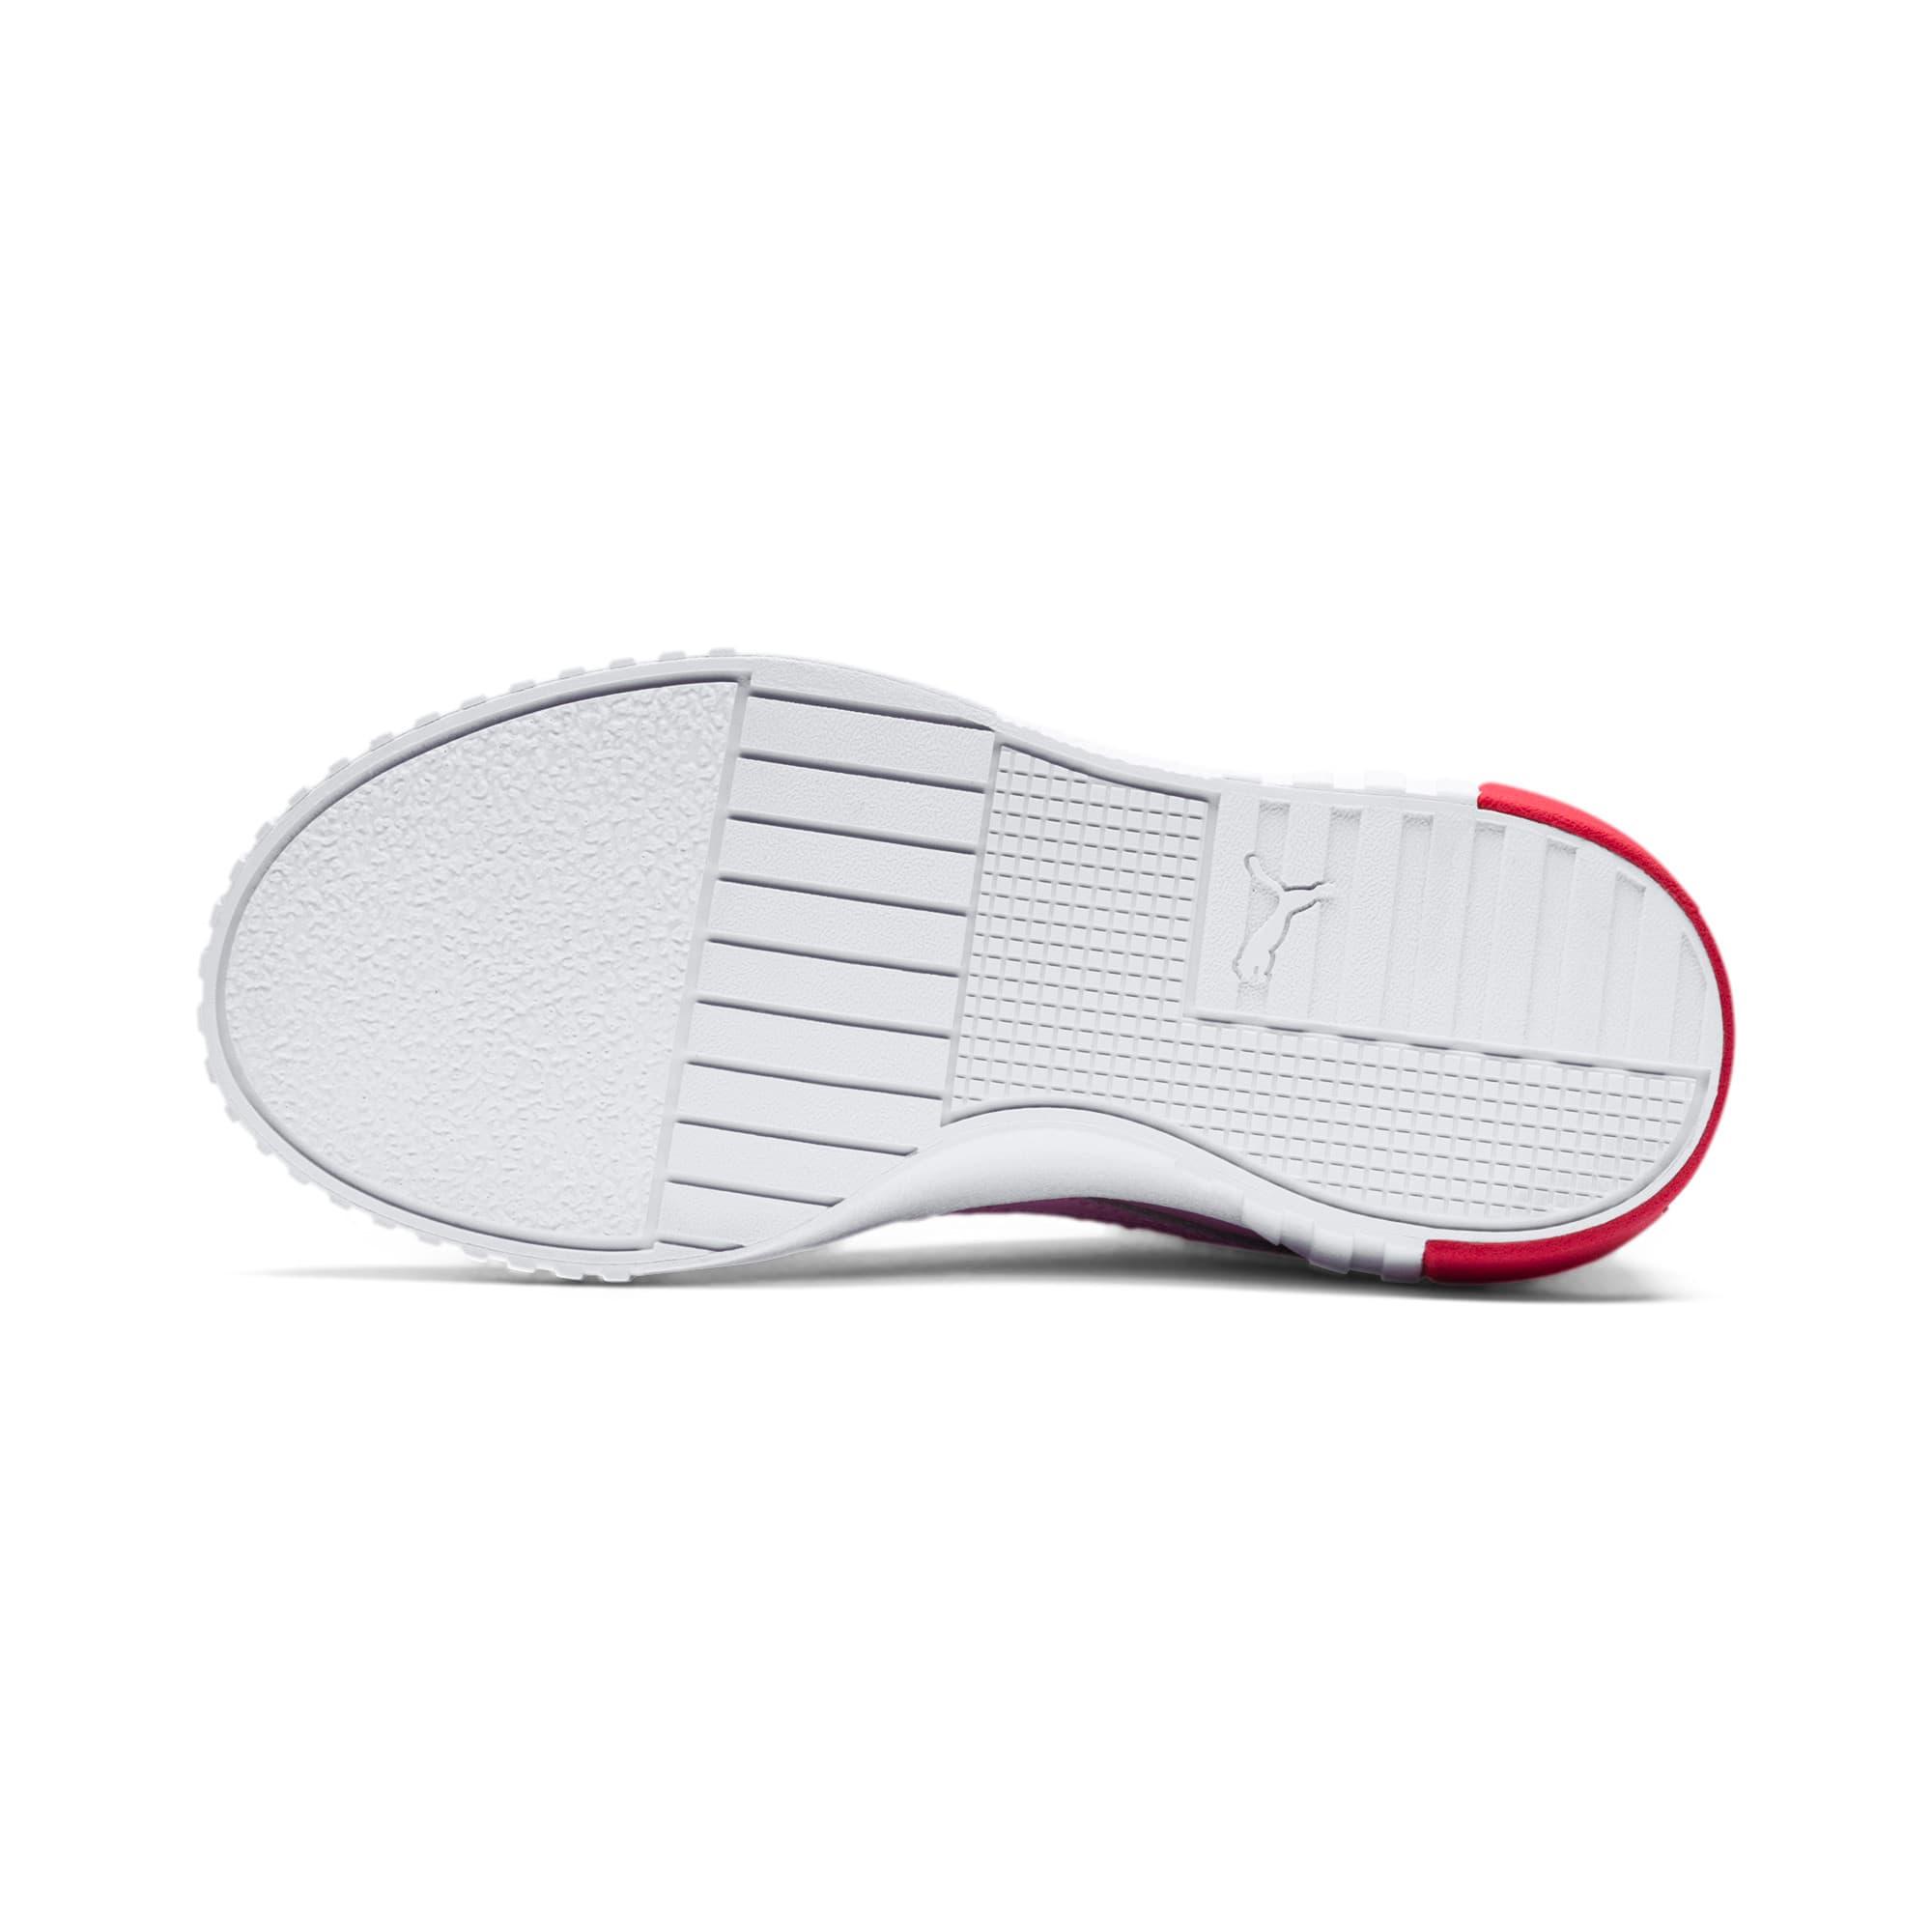 Thumbnail 4 of Cali Little Kids' Shoes, Puma White-Hibiscus, medium